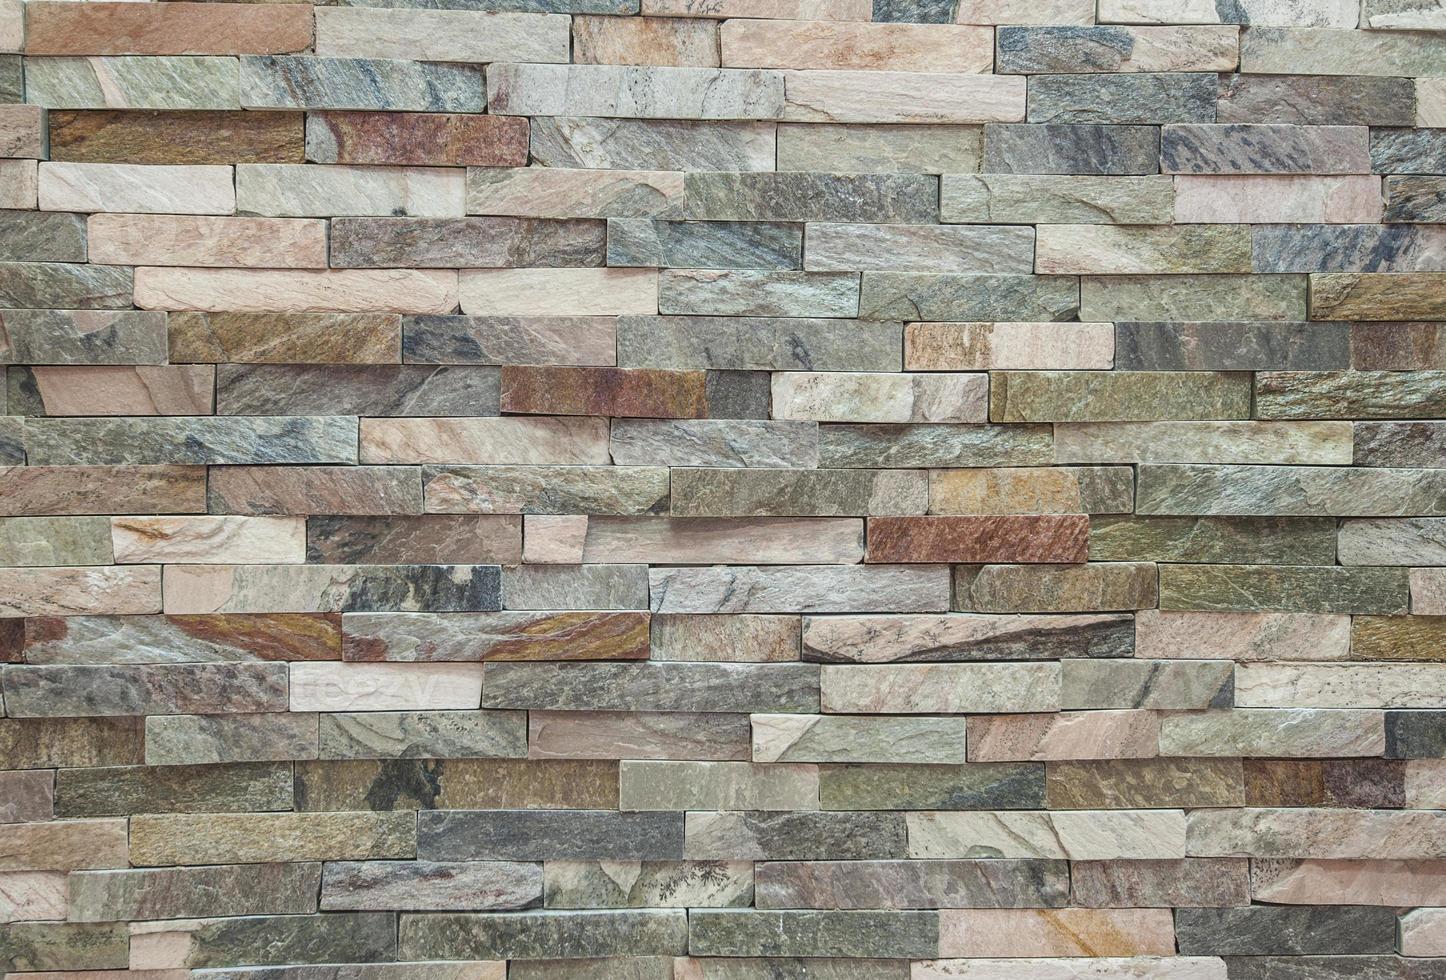 nep stenen muur baksteen achtergrond behang foto